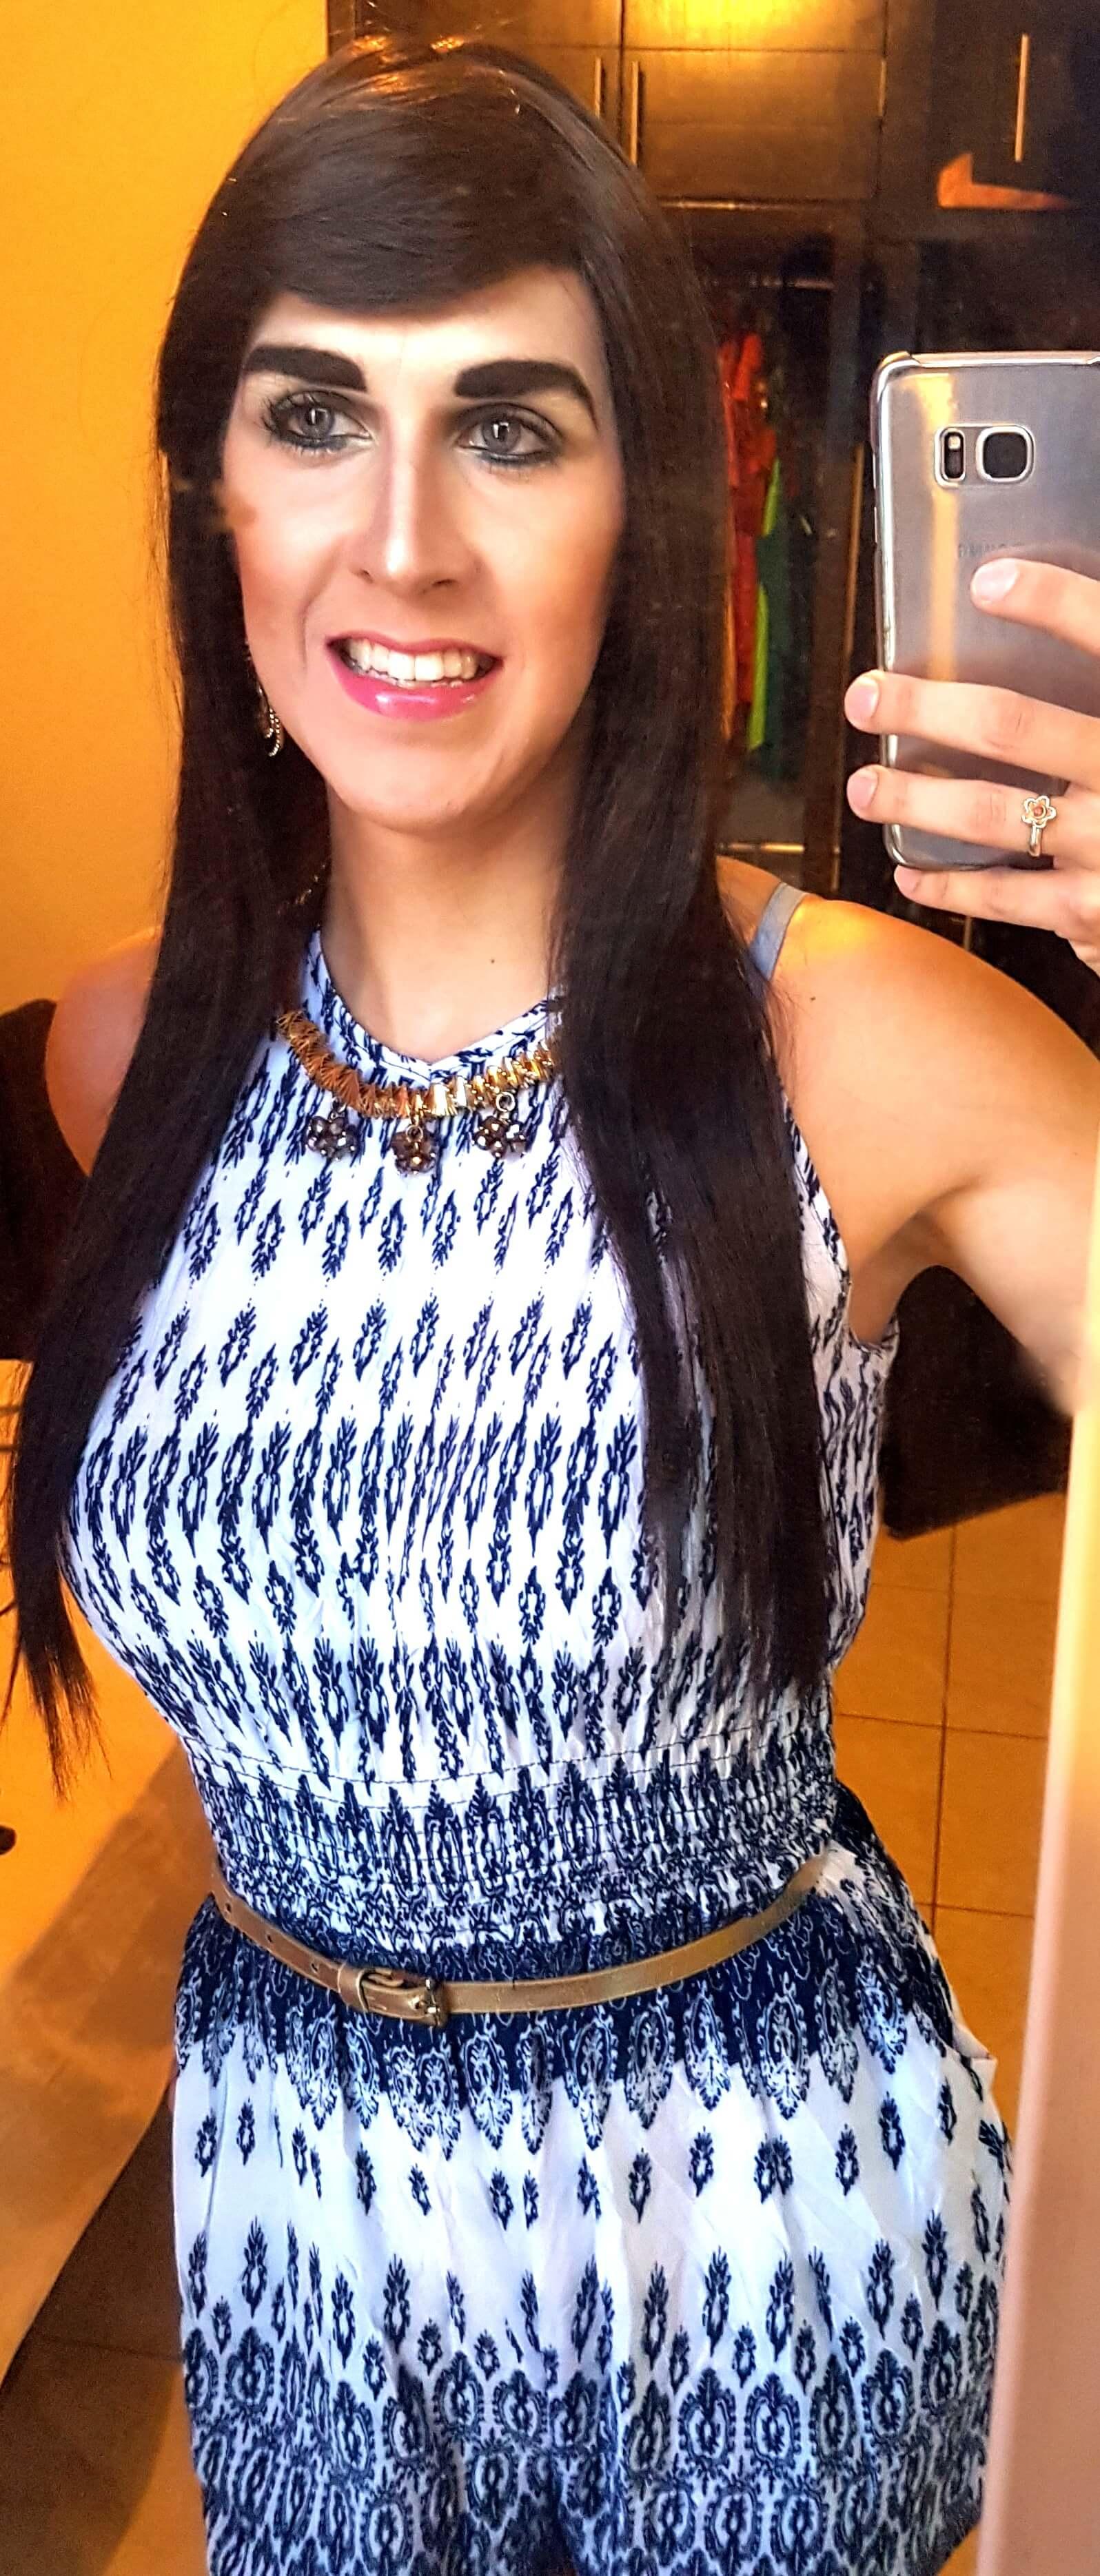 Vanessa Guzman tranny